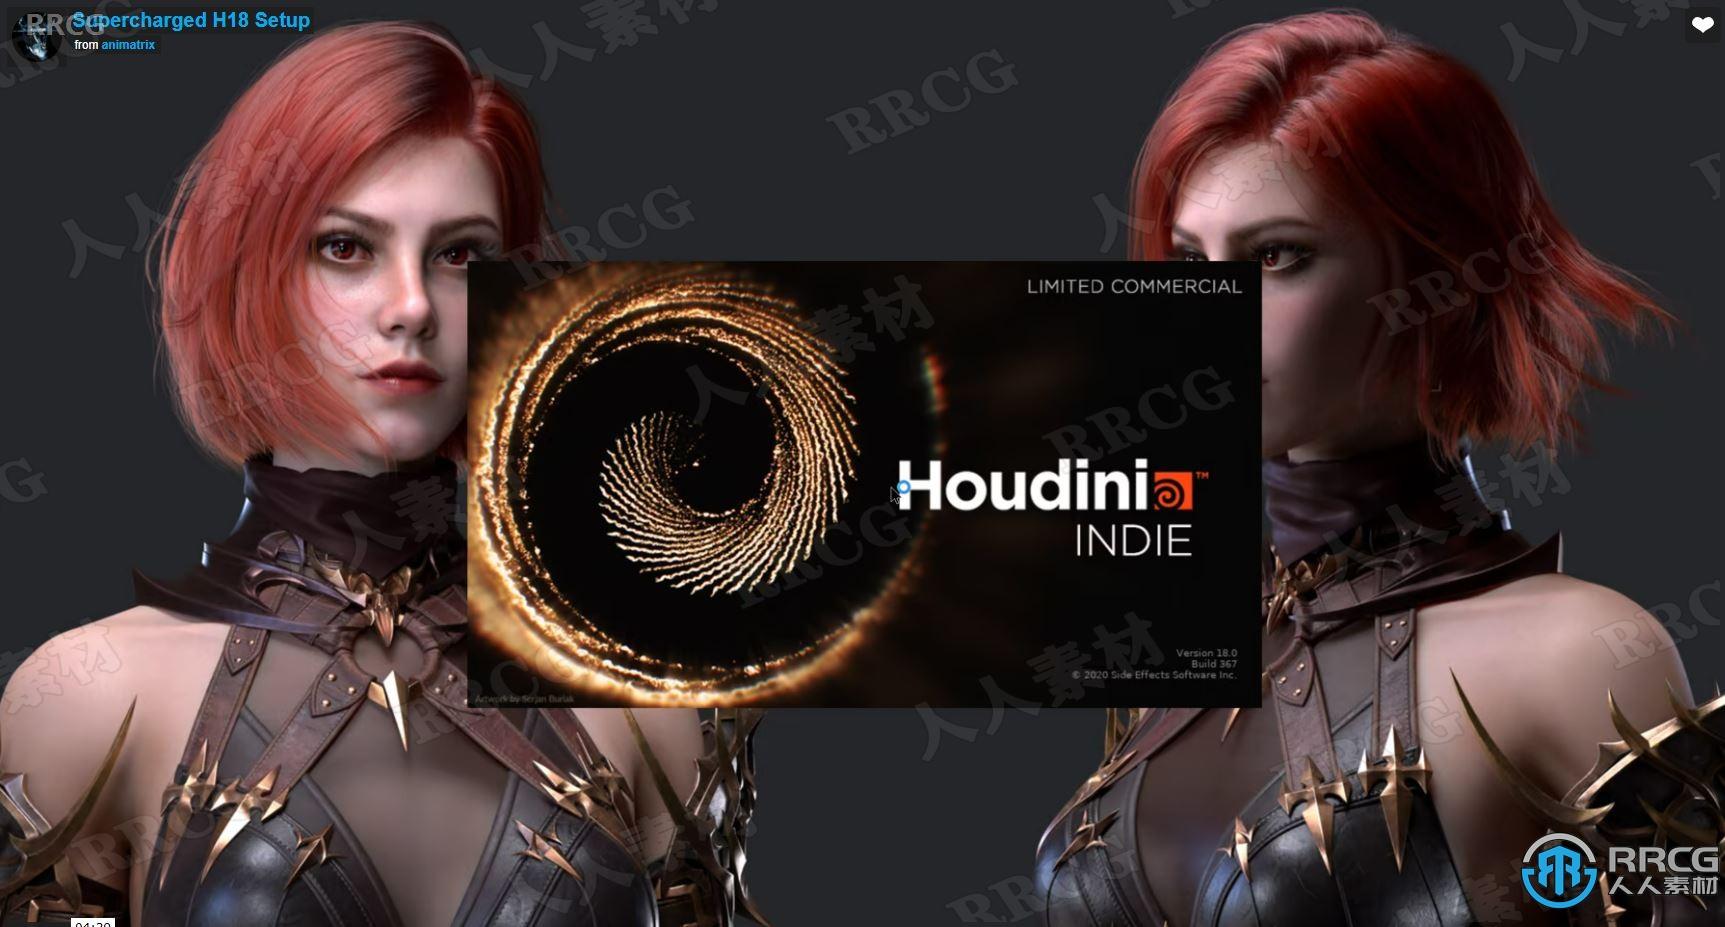 Supercharged高级图形用户界面和工作流程增强功能Houdini插件H18 R5版